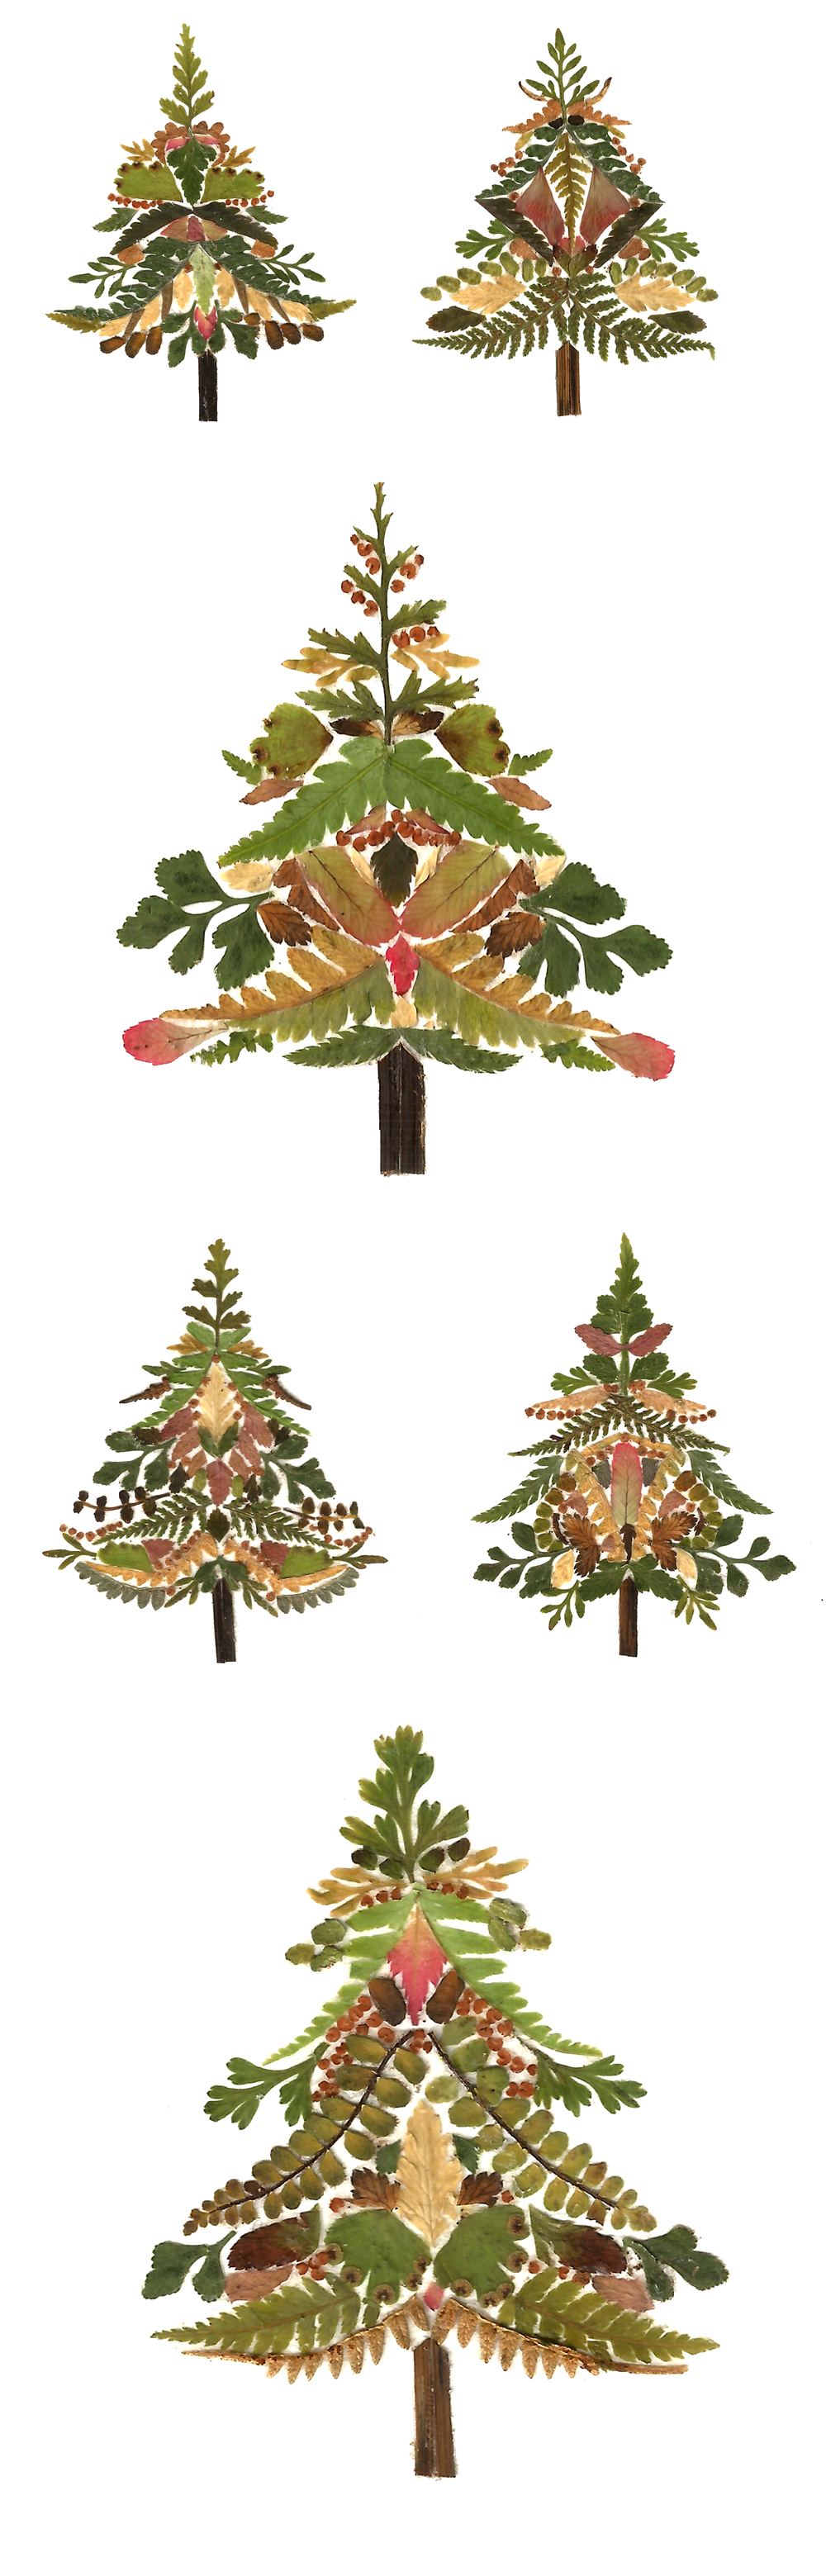 Pressed fern trees